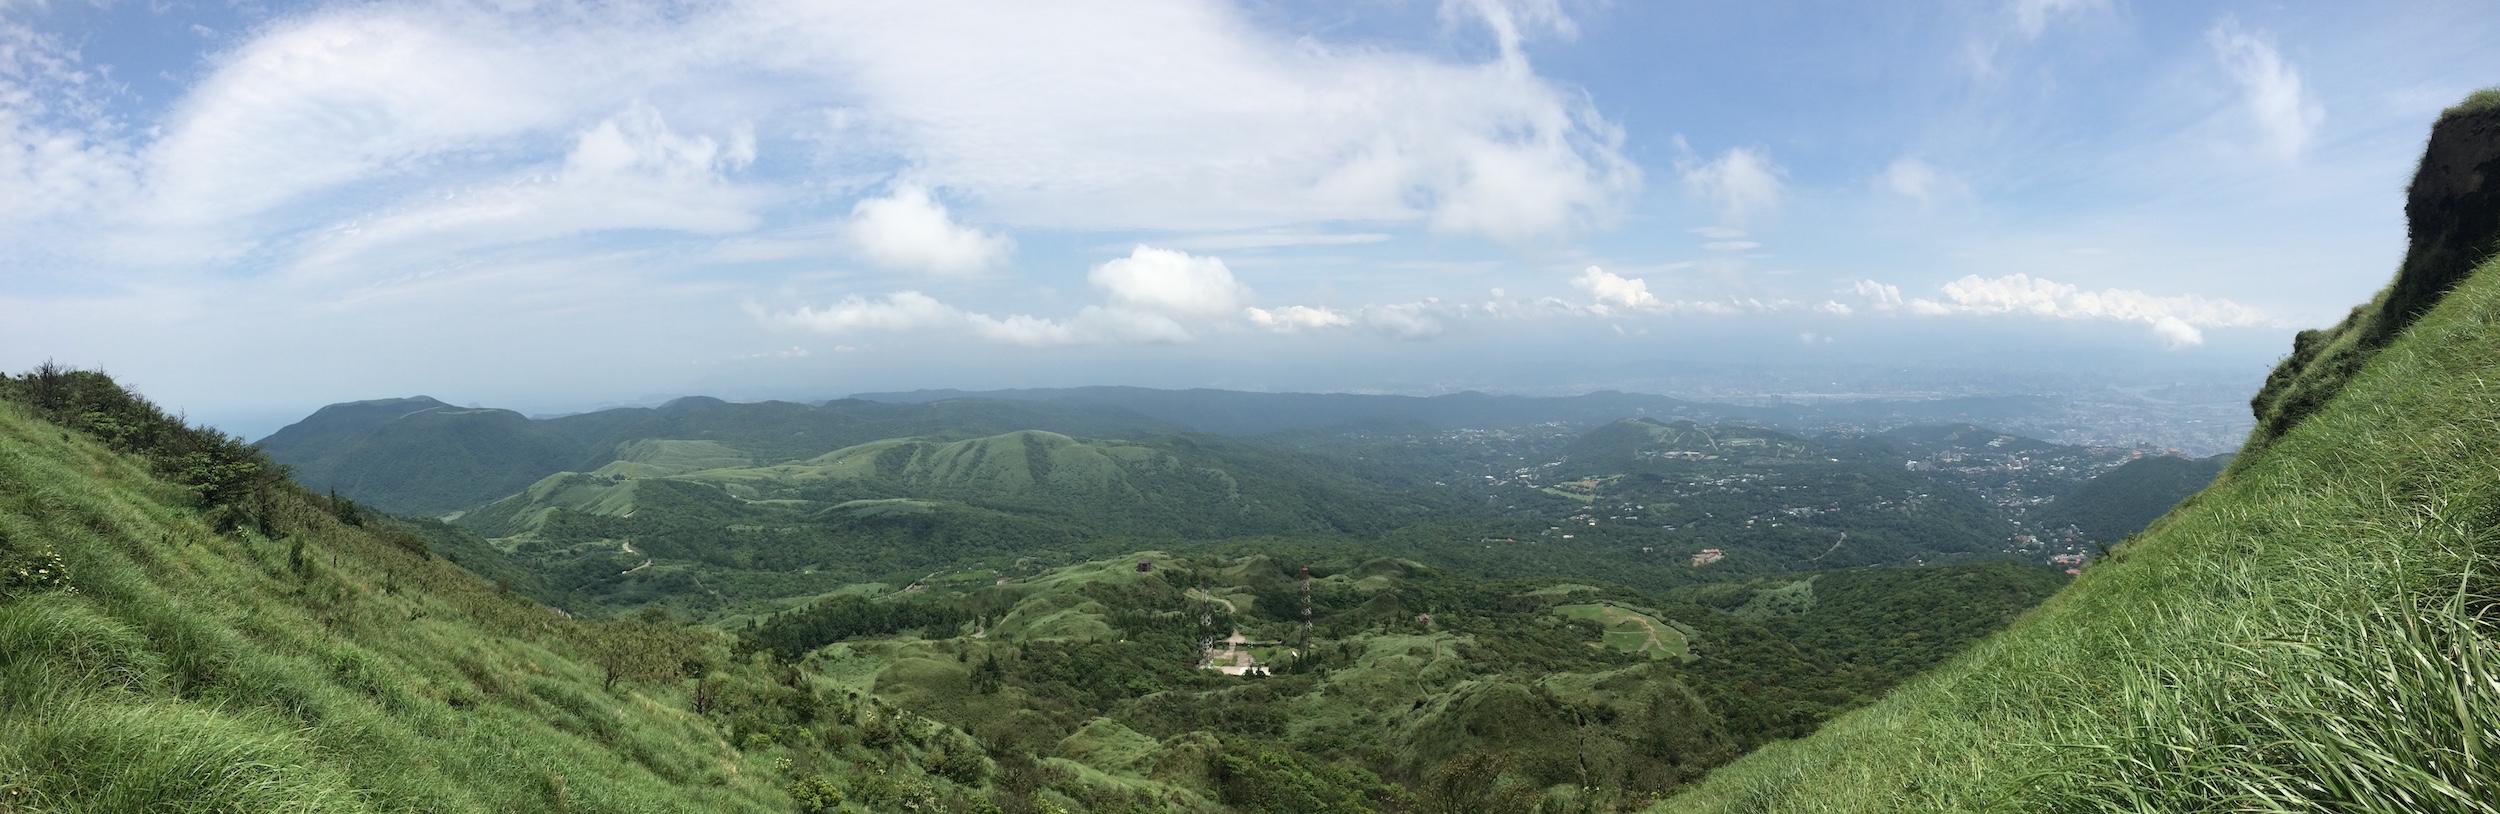 Julie PVT à Taiwan 2